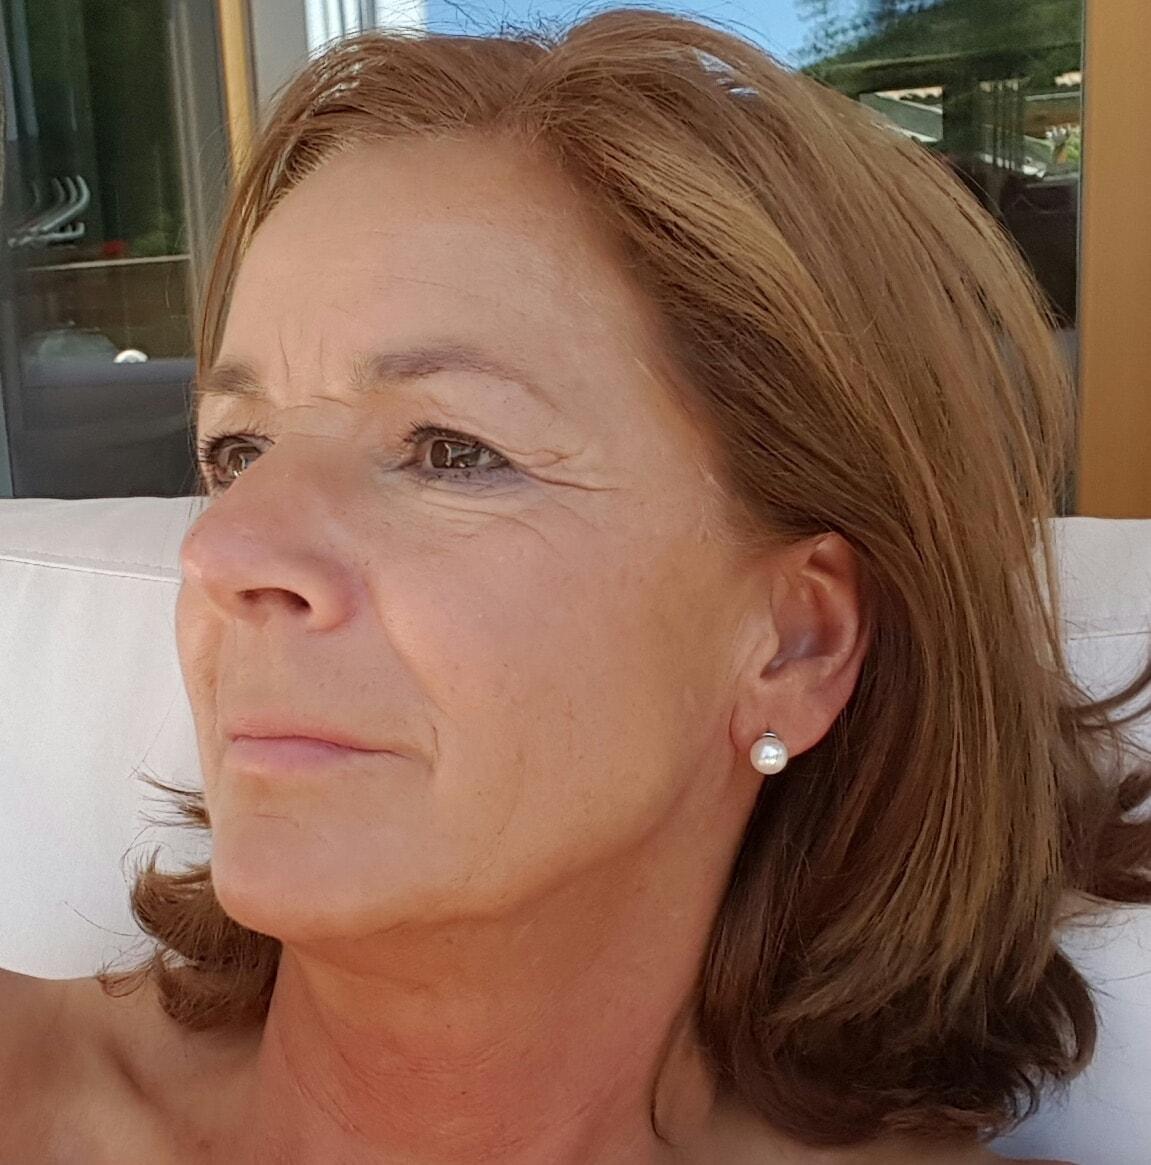 Martha from Moso Moos